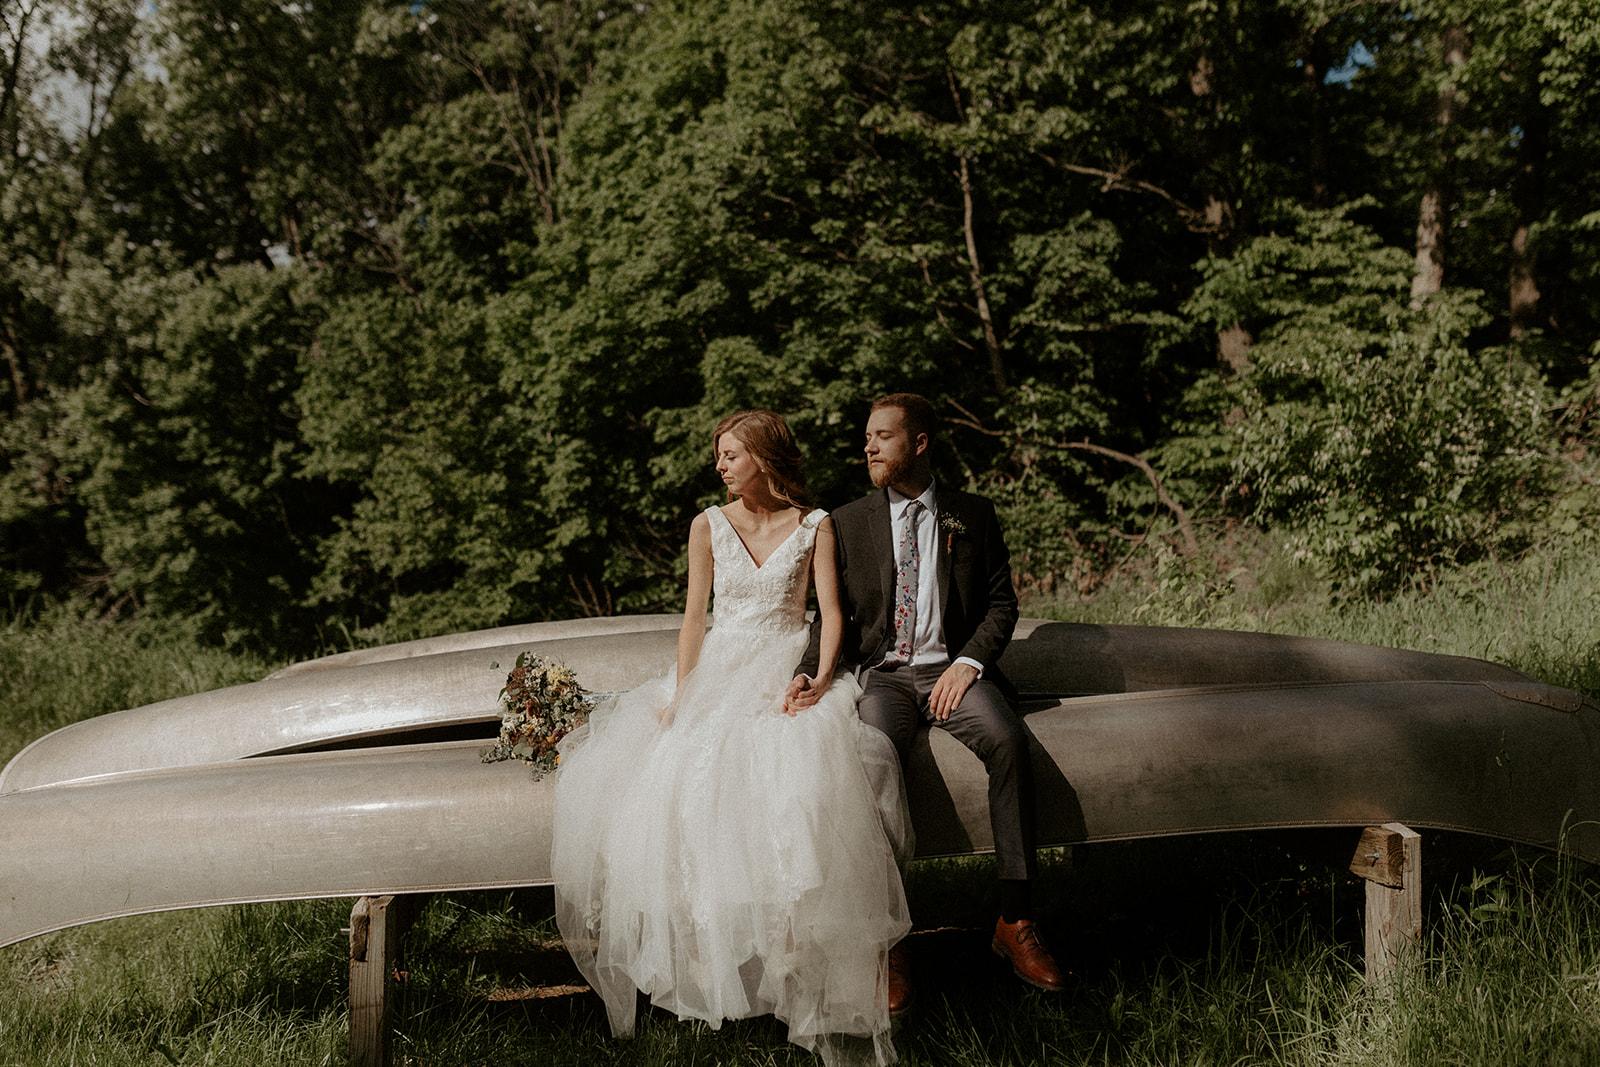 camp_wokanda_peoria_illinois_wedding_photographer_wright_photographs_bliese_0726.jpg